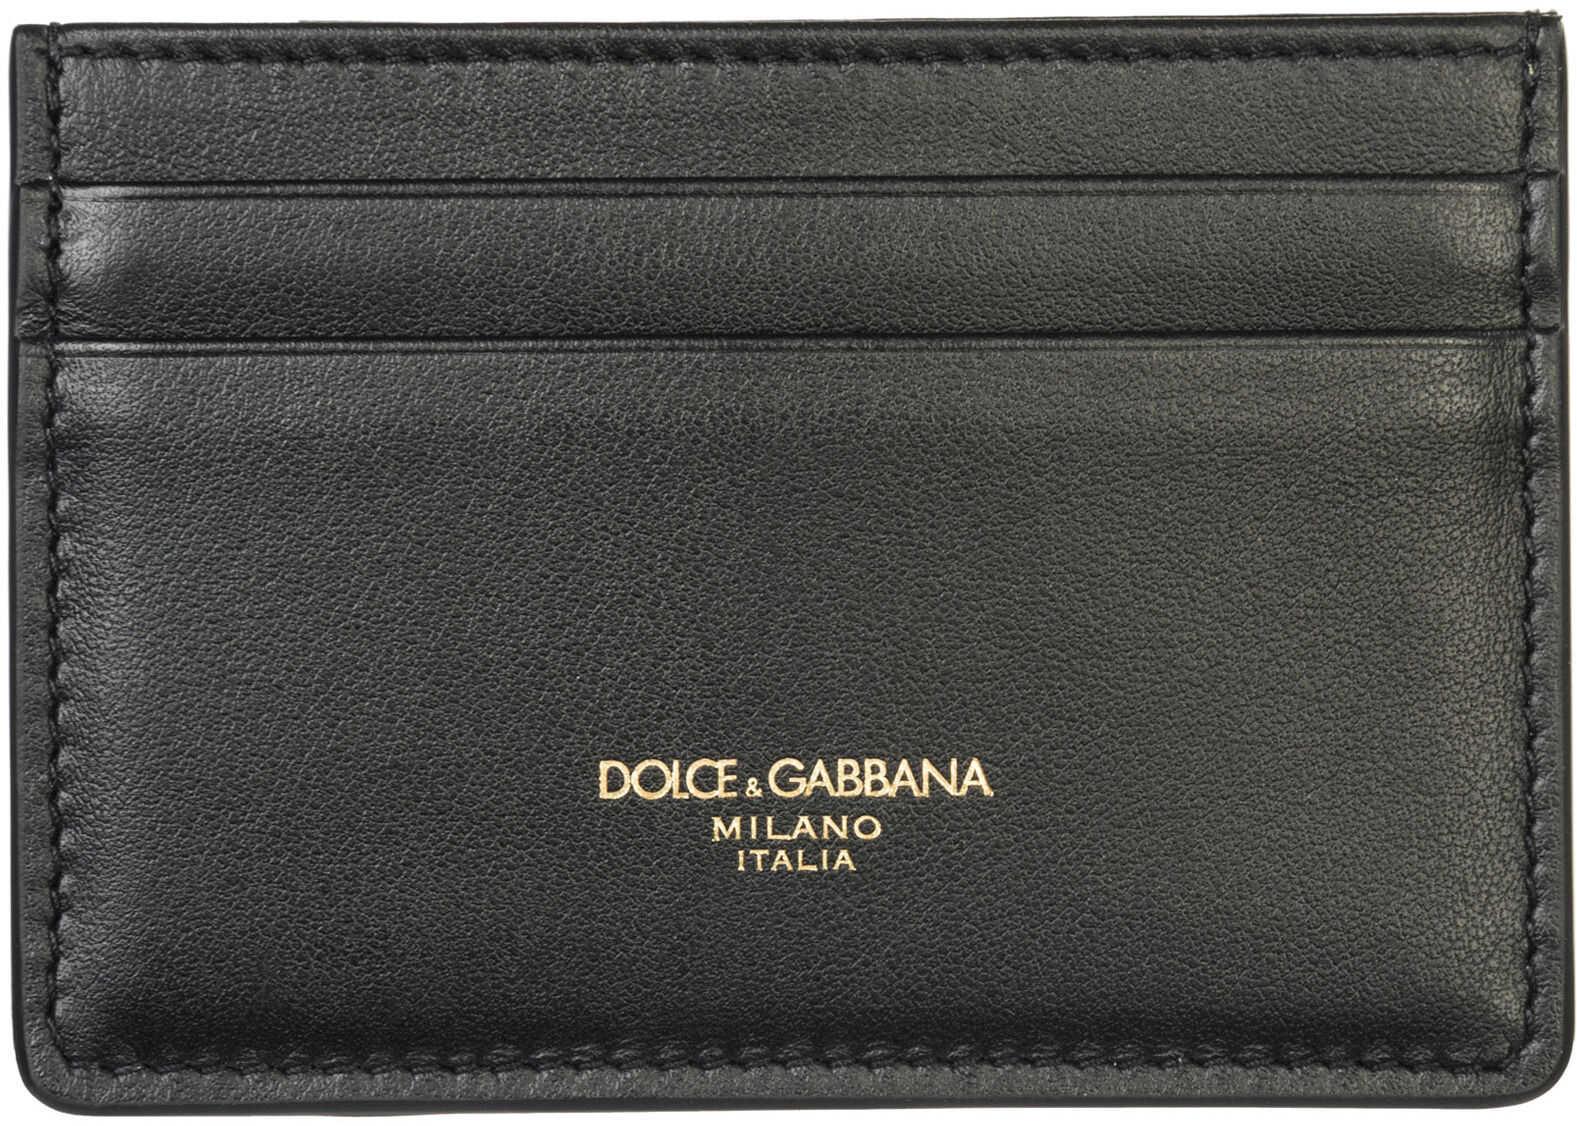 Dolce & Gabbana Clip Wallet Black